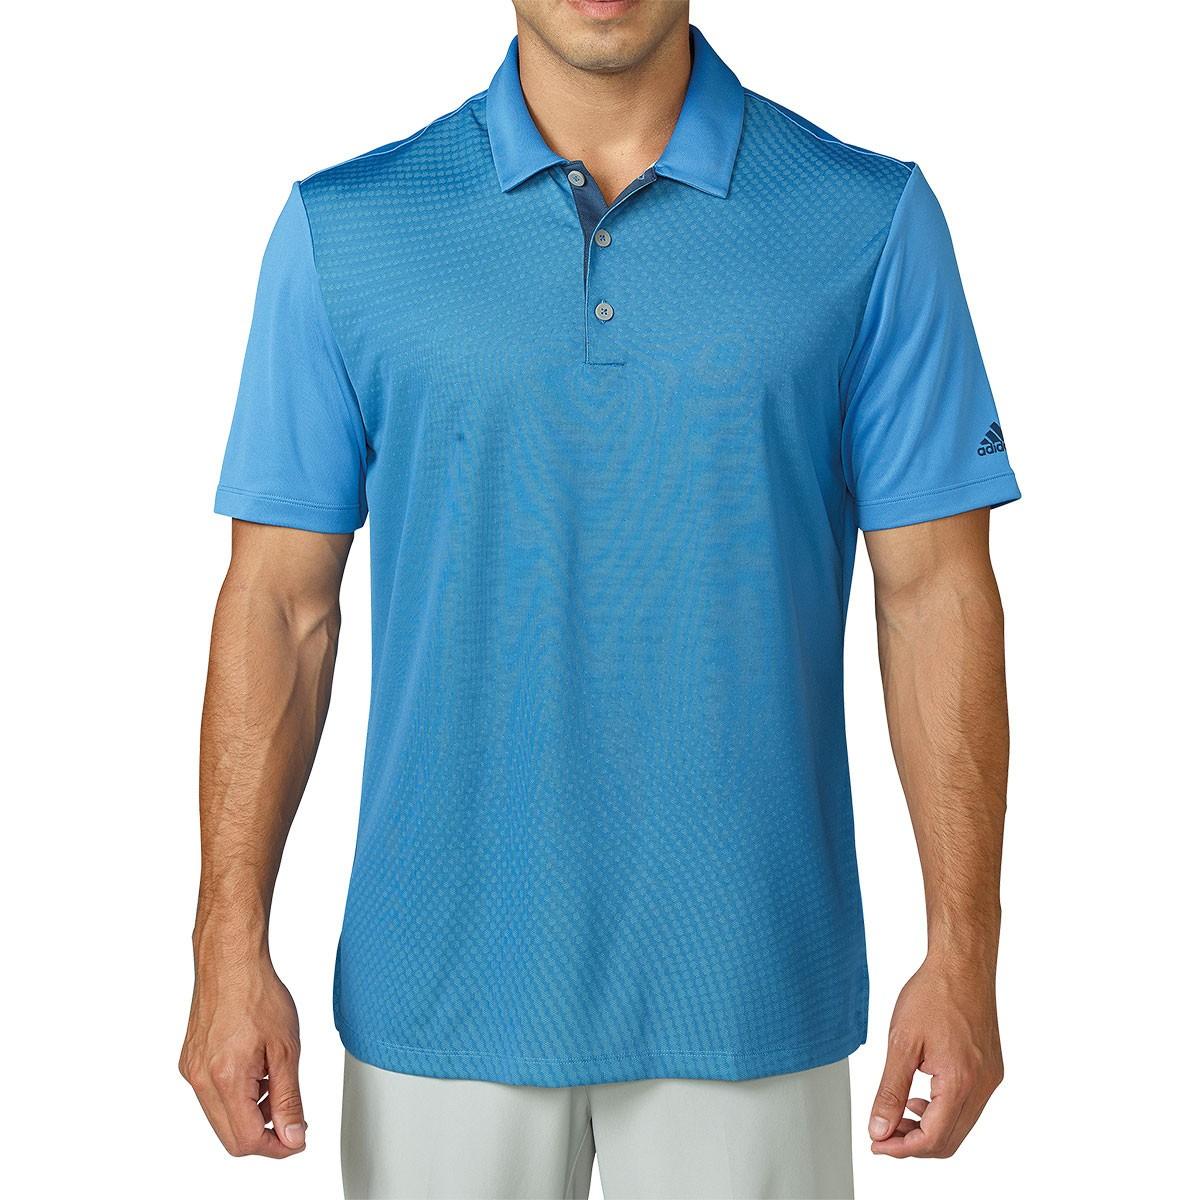 Adidas Golf Uomo Climacool Dot Gradiente Polo